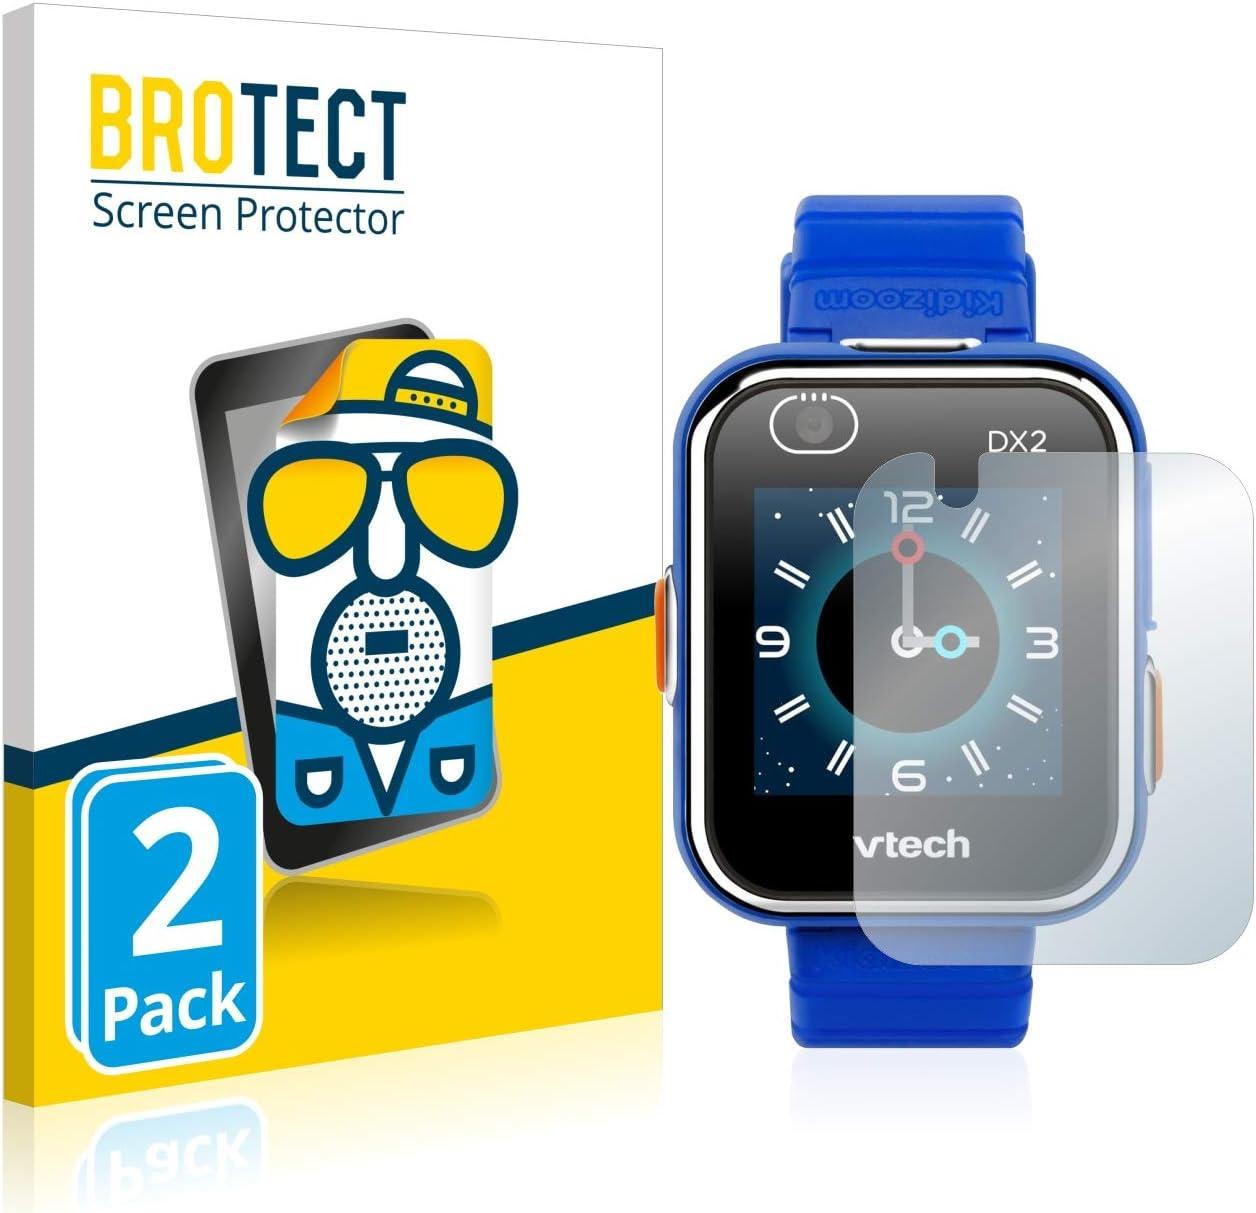 BROTECT Protector Pantalla Anti-Reflejos Compatible con Vtech Kidizoom Smart Watch DX2 (2 Unidades) Pelicula Mate Anti-Huellas